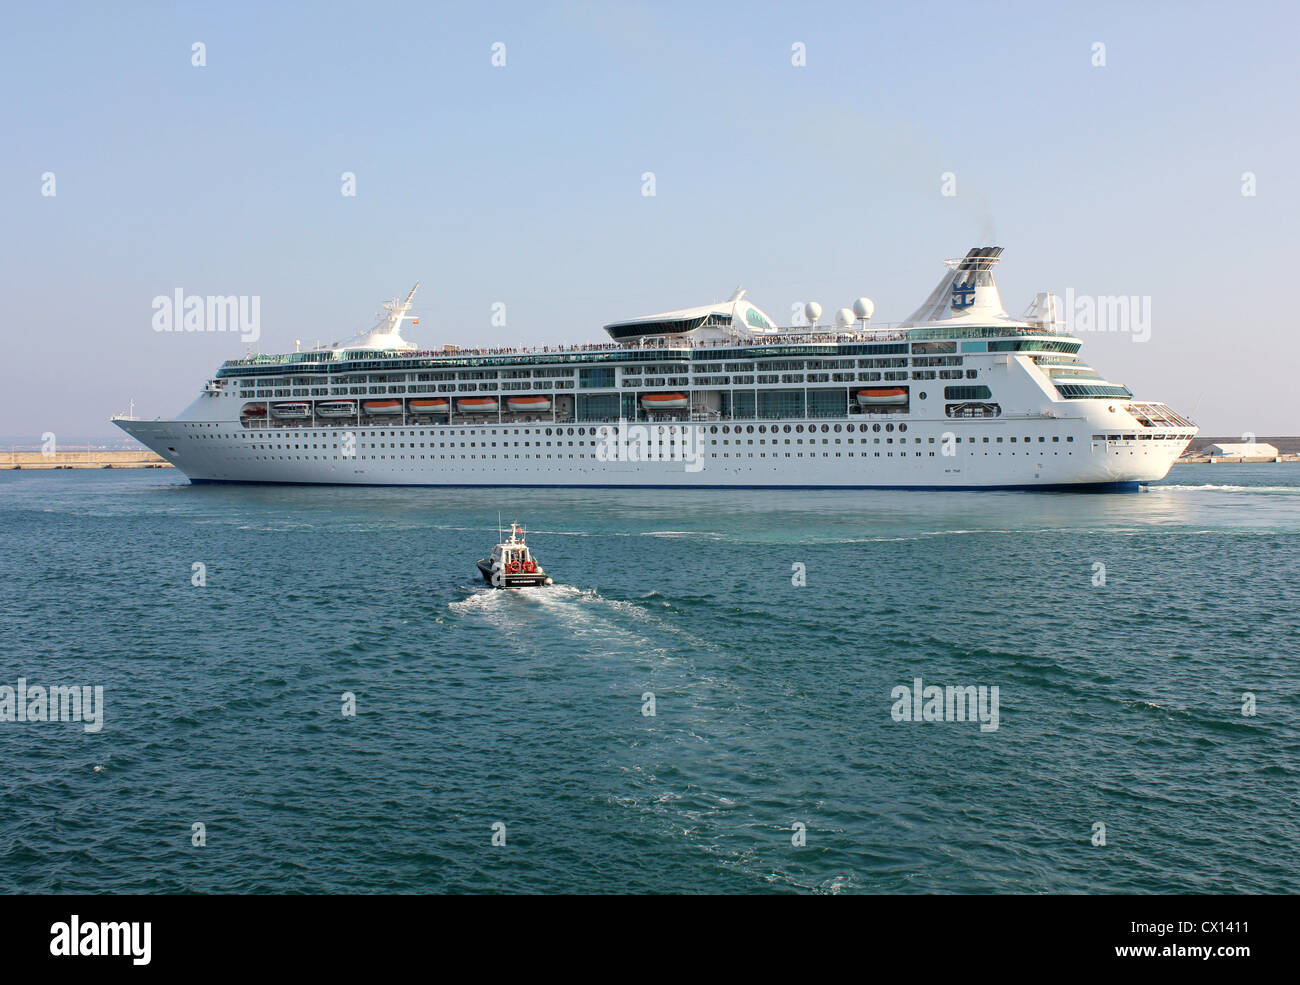 Royal Caribbean International Cruise Line 'Grandeur of the Seas' departing the Port of Palma de Mallorca - Stock Image